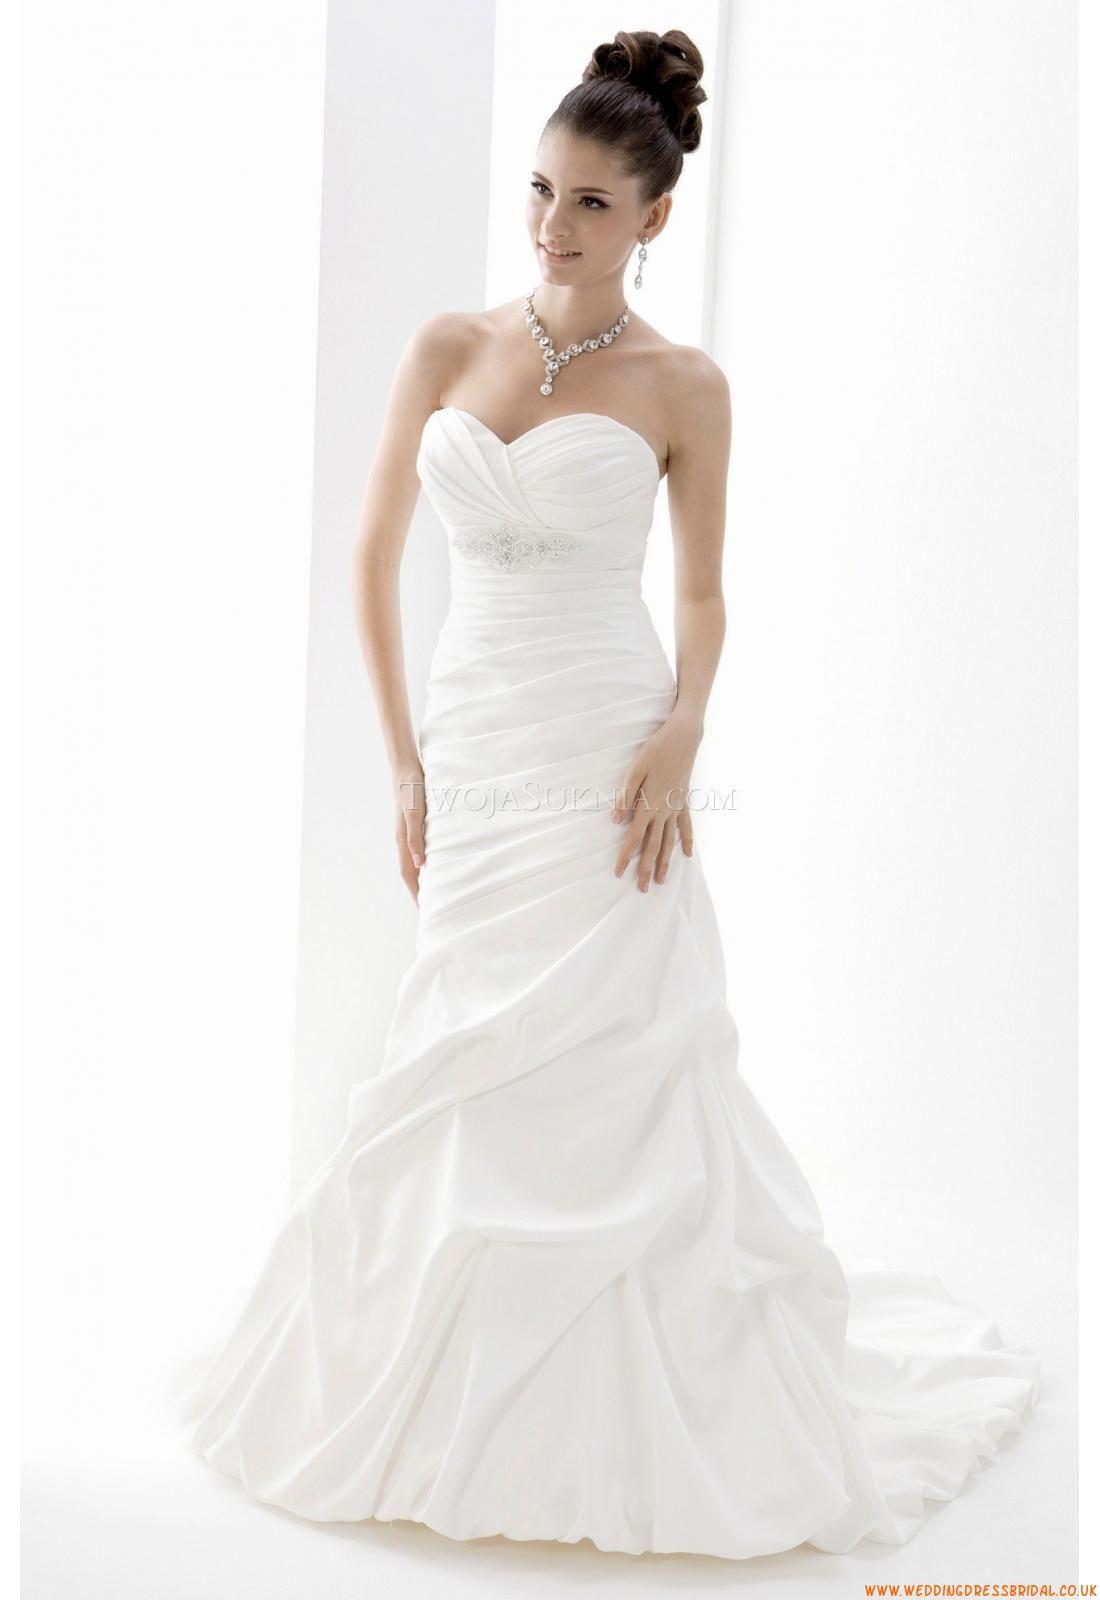 Wedding dresses venus at angel u tradition love weddings